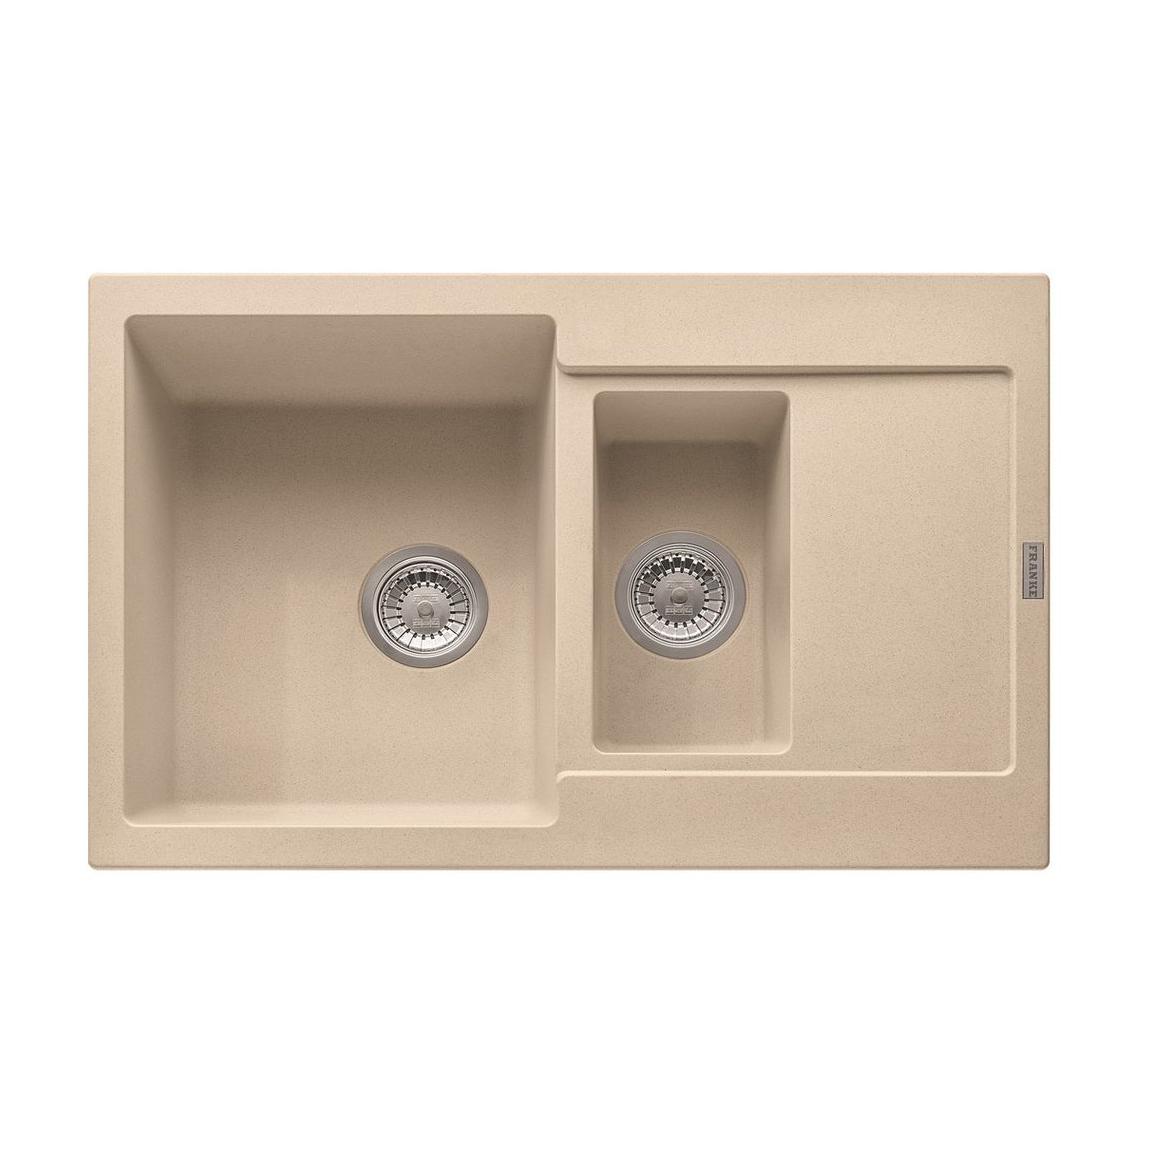 Кухонная мойка Franke Maris MRG 651-78 бежевая мойка franke cog 651 белая